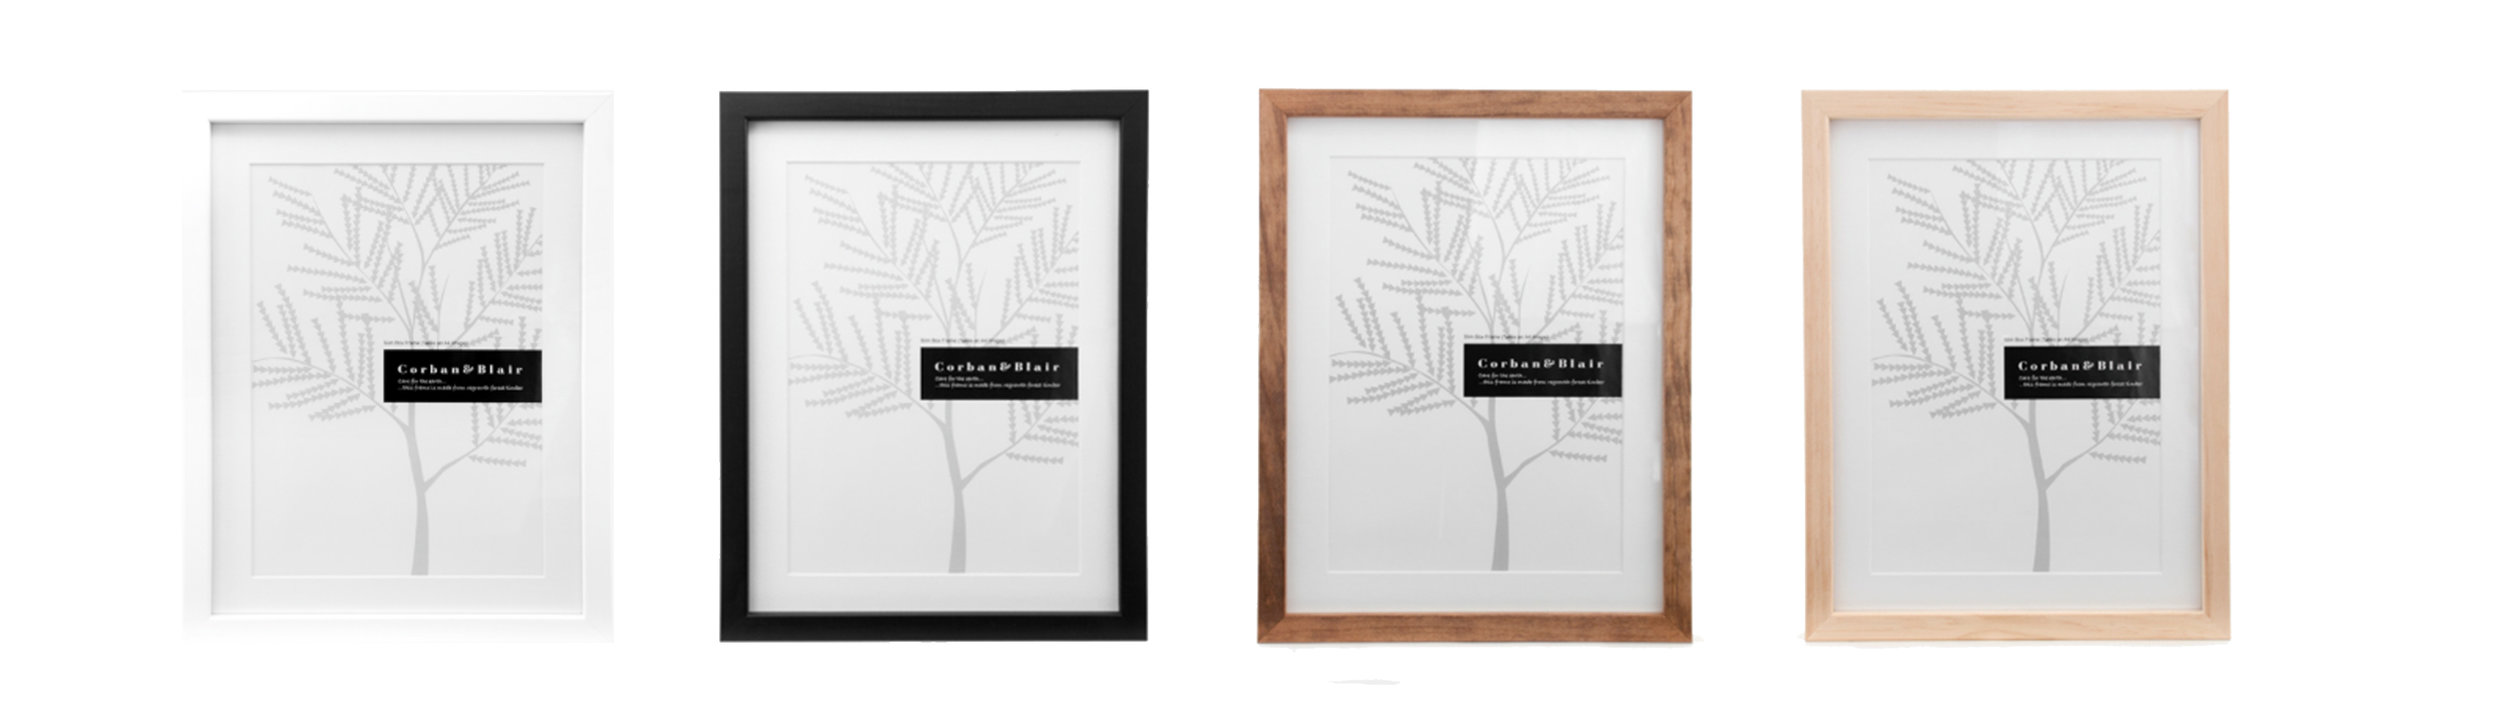 a4 frame including white mount $50 inc gst                A3 FRAME INCLUDING WHITE MOUNT $75 INC GST         four colours AVAILABLE  white  black  walnut  natural